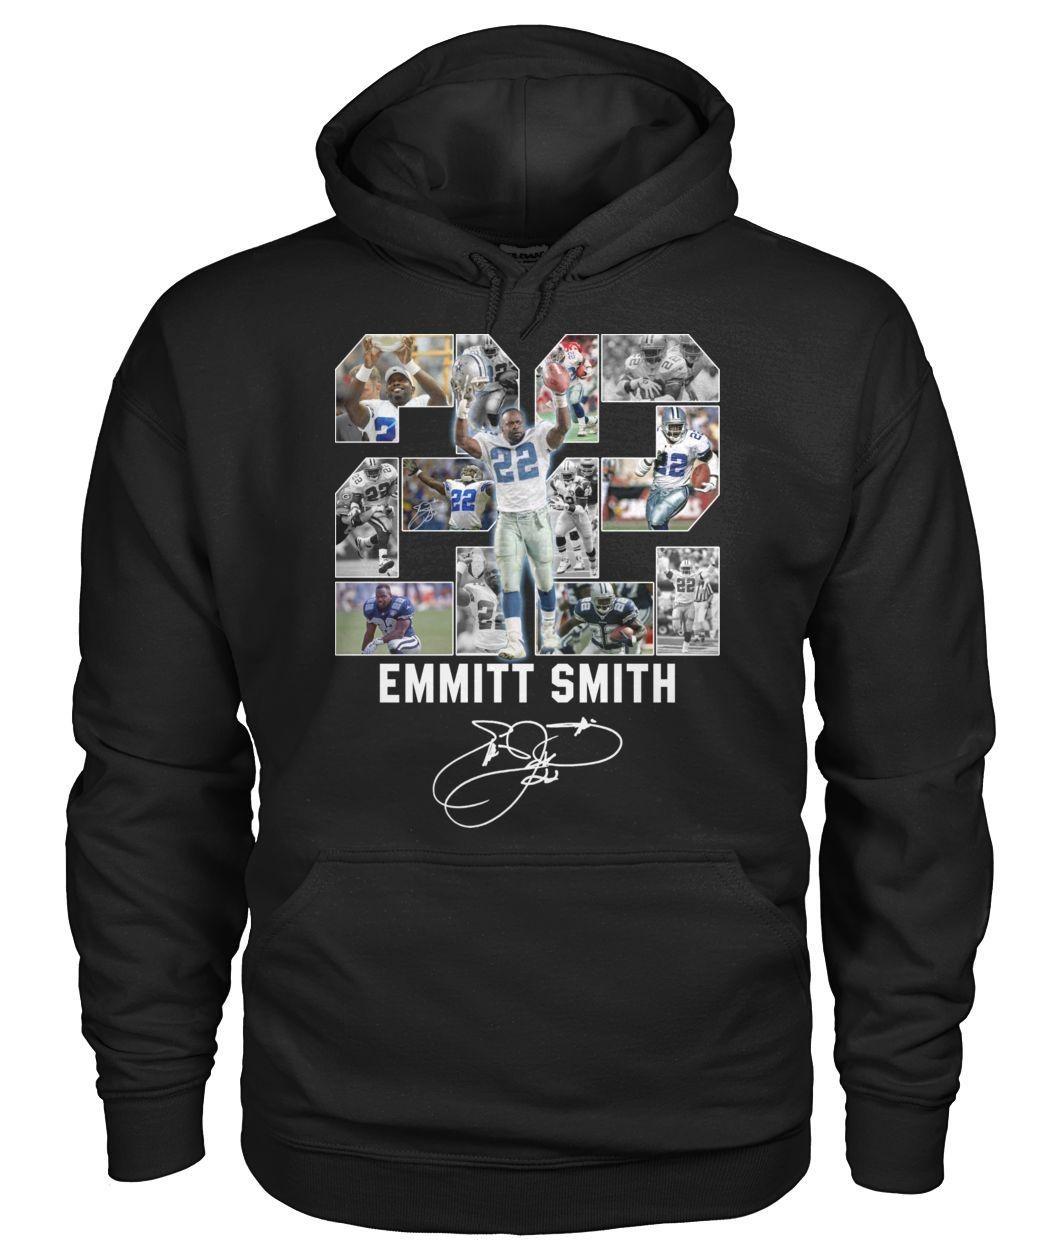 22 Emmitt Smith signatures shirt